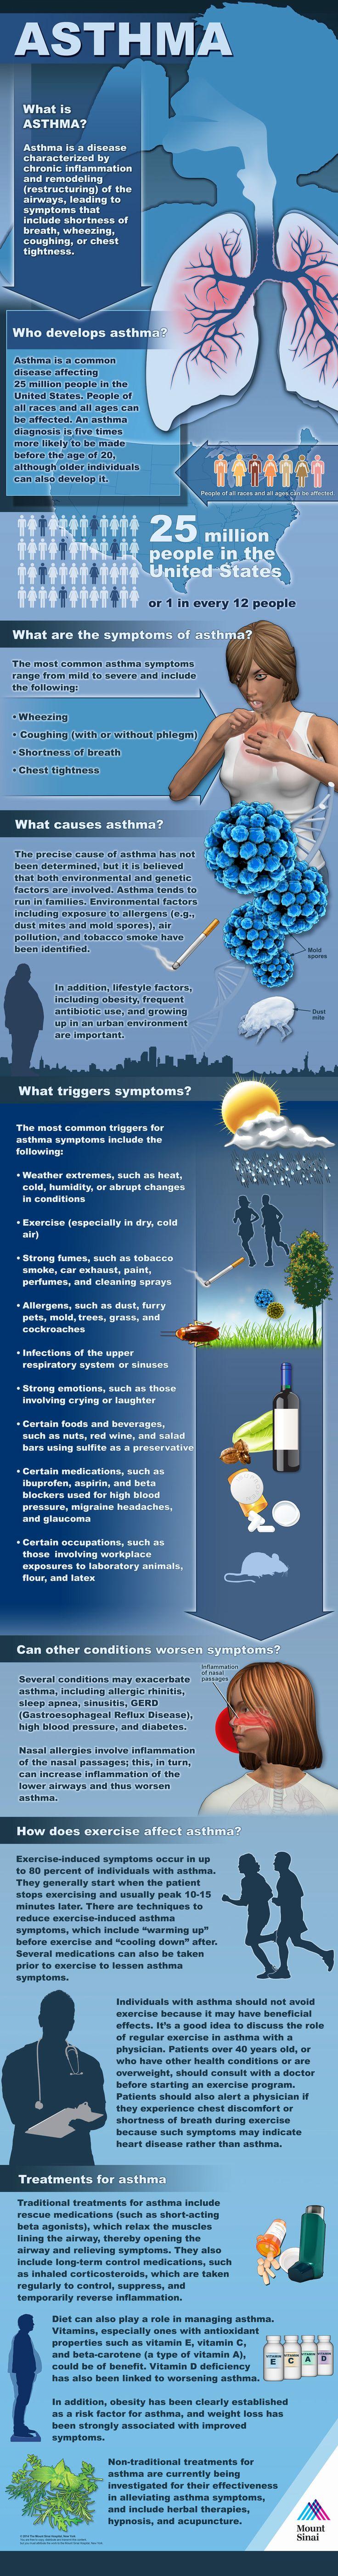 Asthma Infographic | Mount Sinai - National Jewish Health